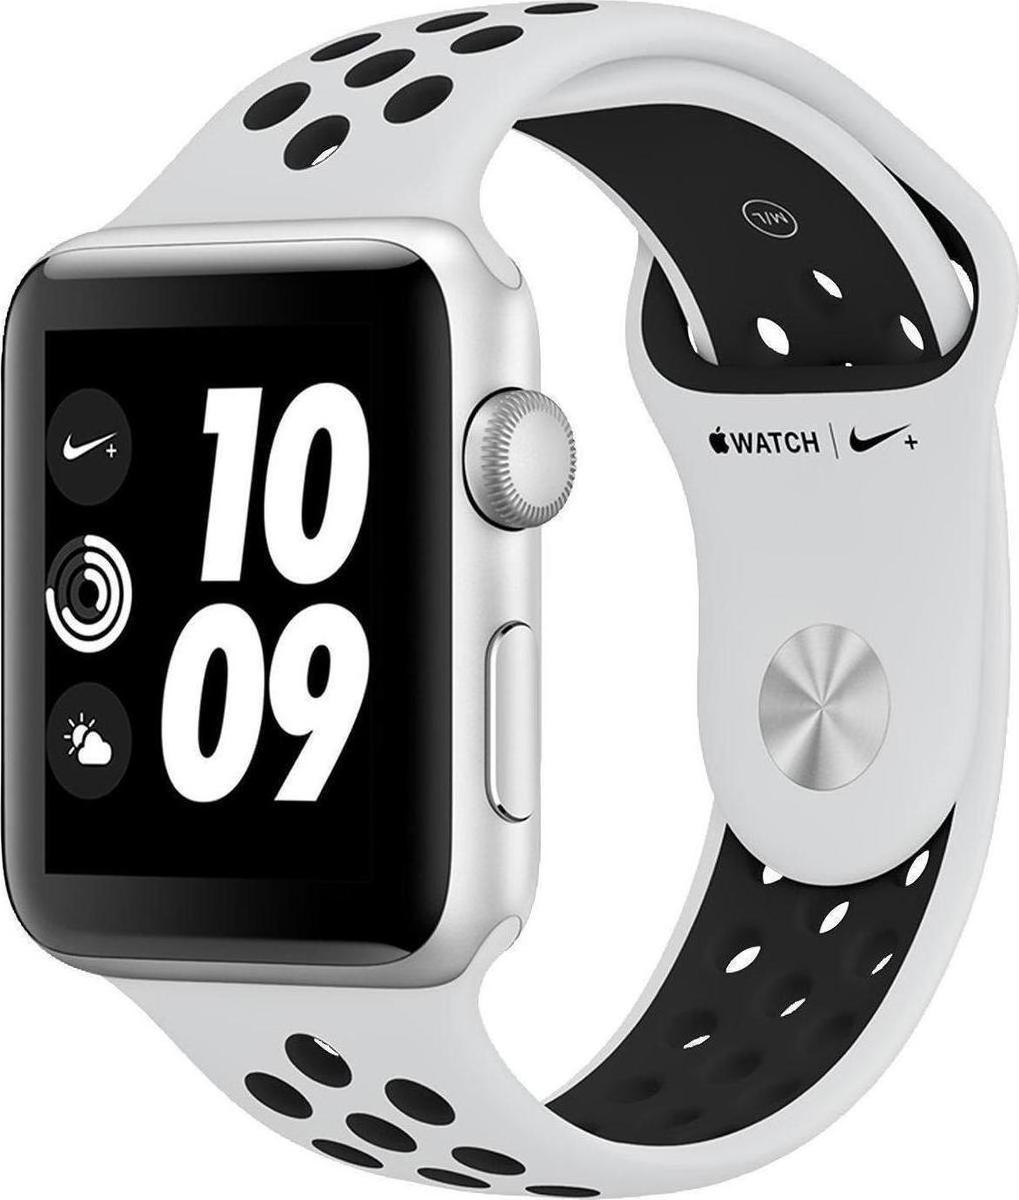 Apple Watch Series 3 Nike+ 42mm Aluminium Silver Platinum Black Plastic Sport Band Πληρωμή έως 12 δόσεις